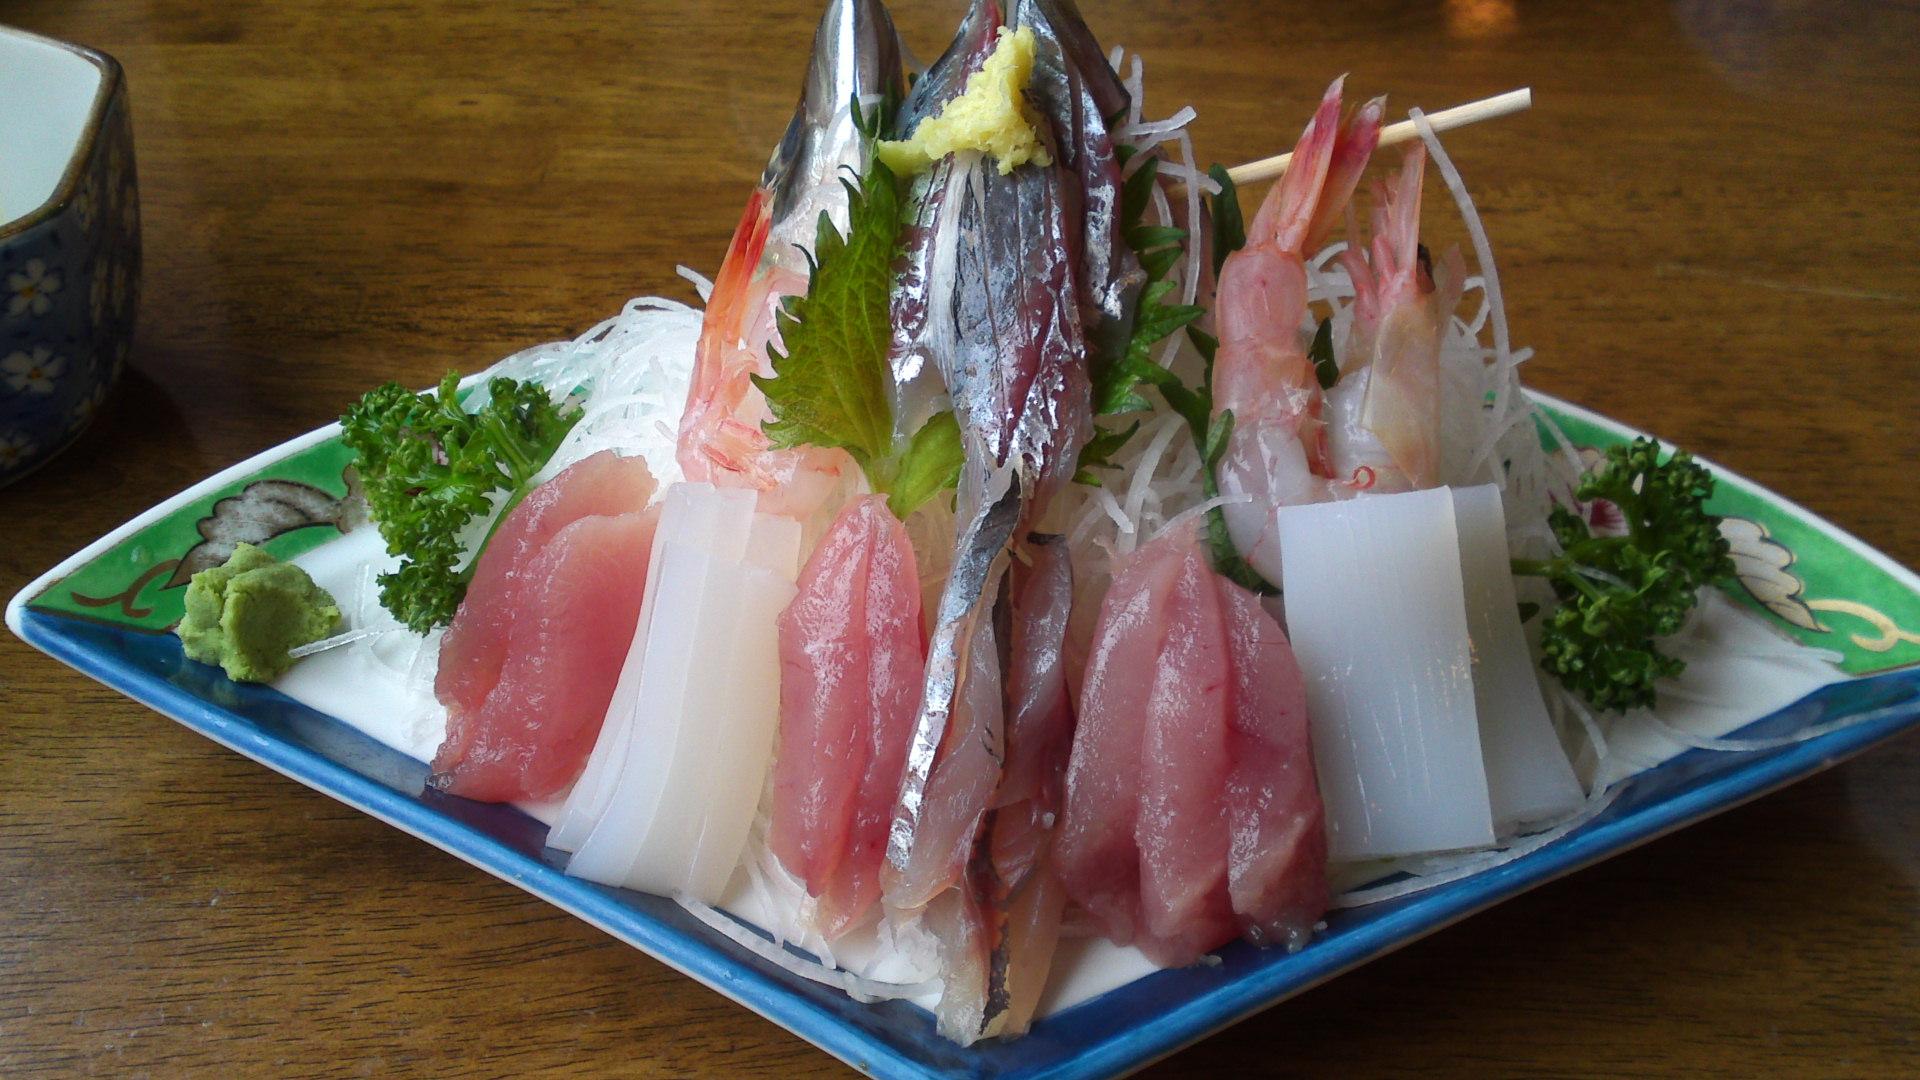 Sashimi shizuoka local fish at uosei in heda izu for Best sashimi fish